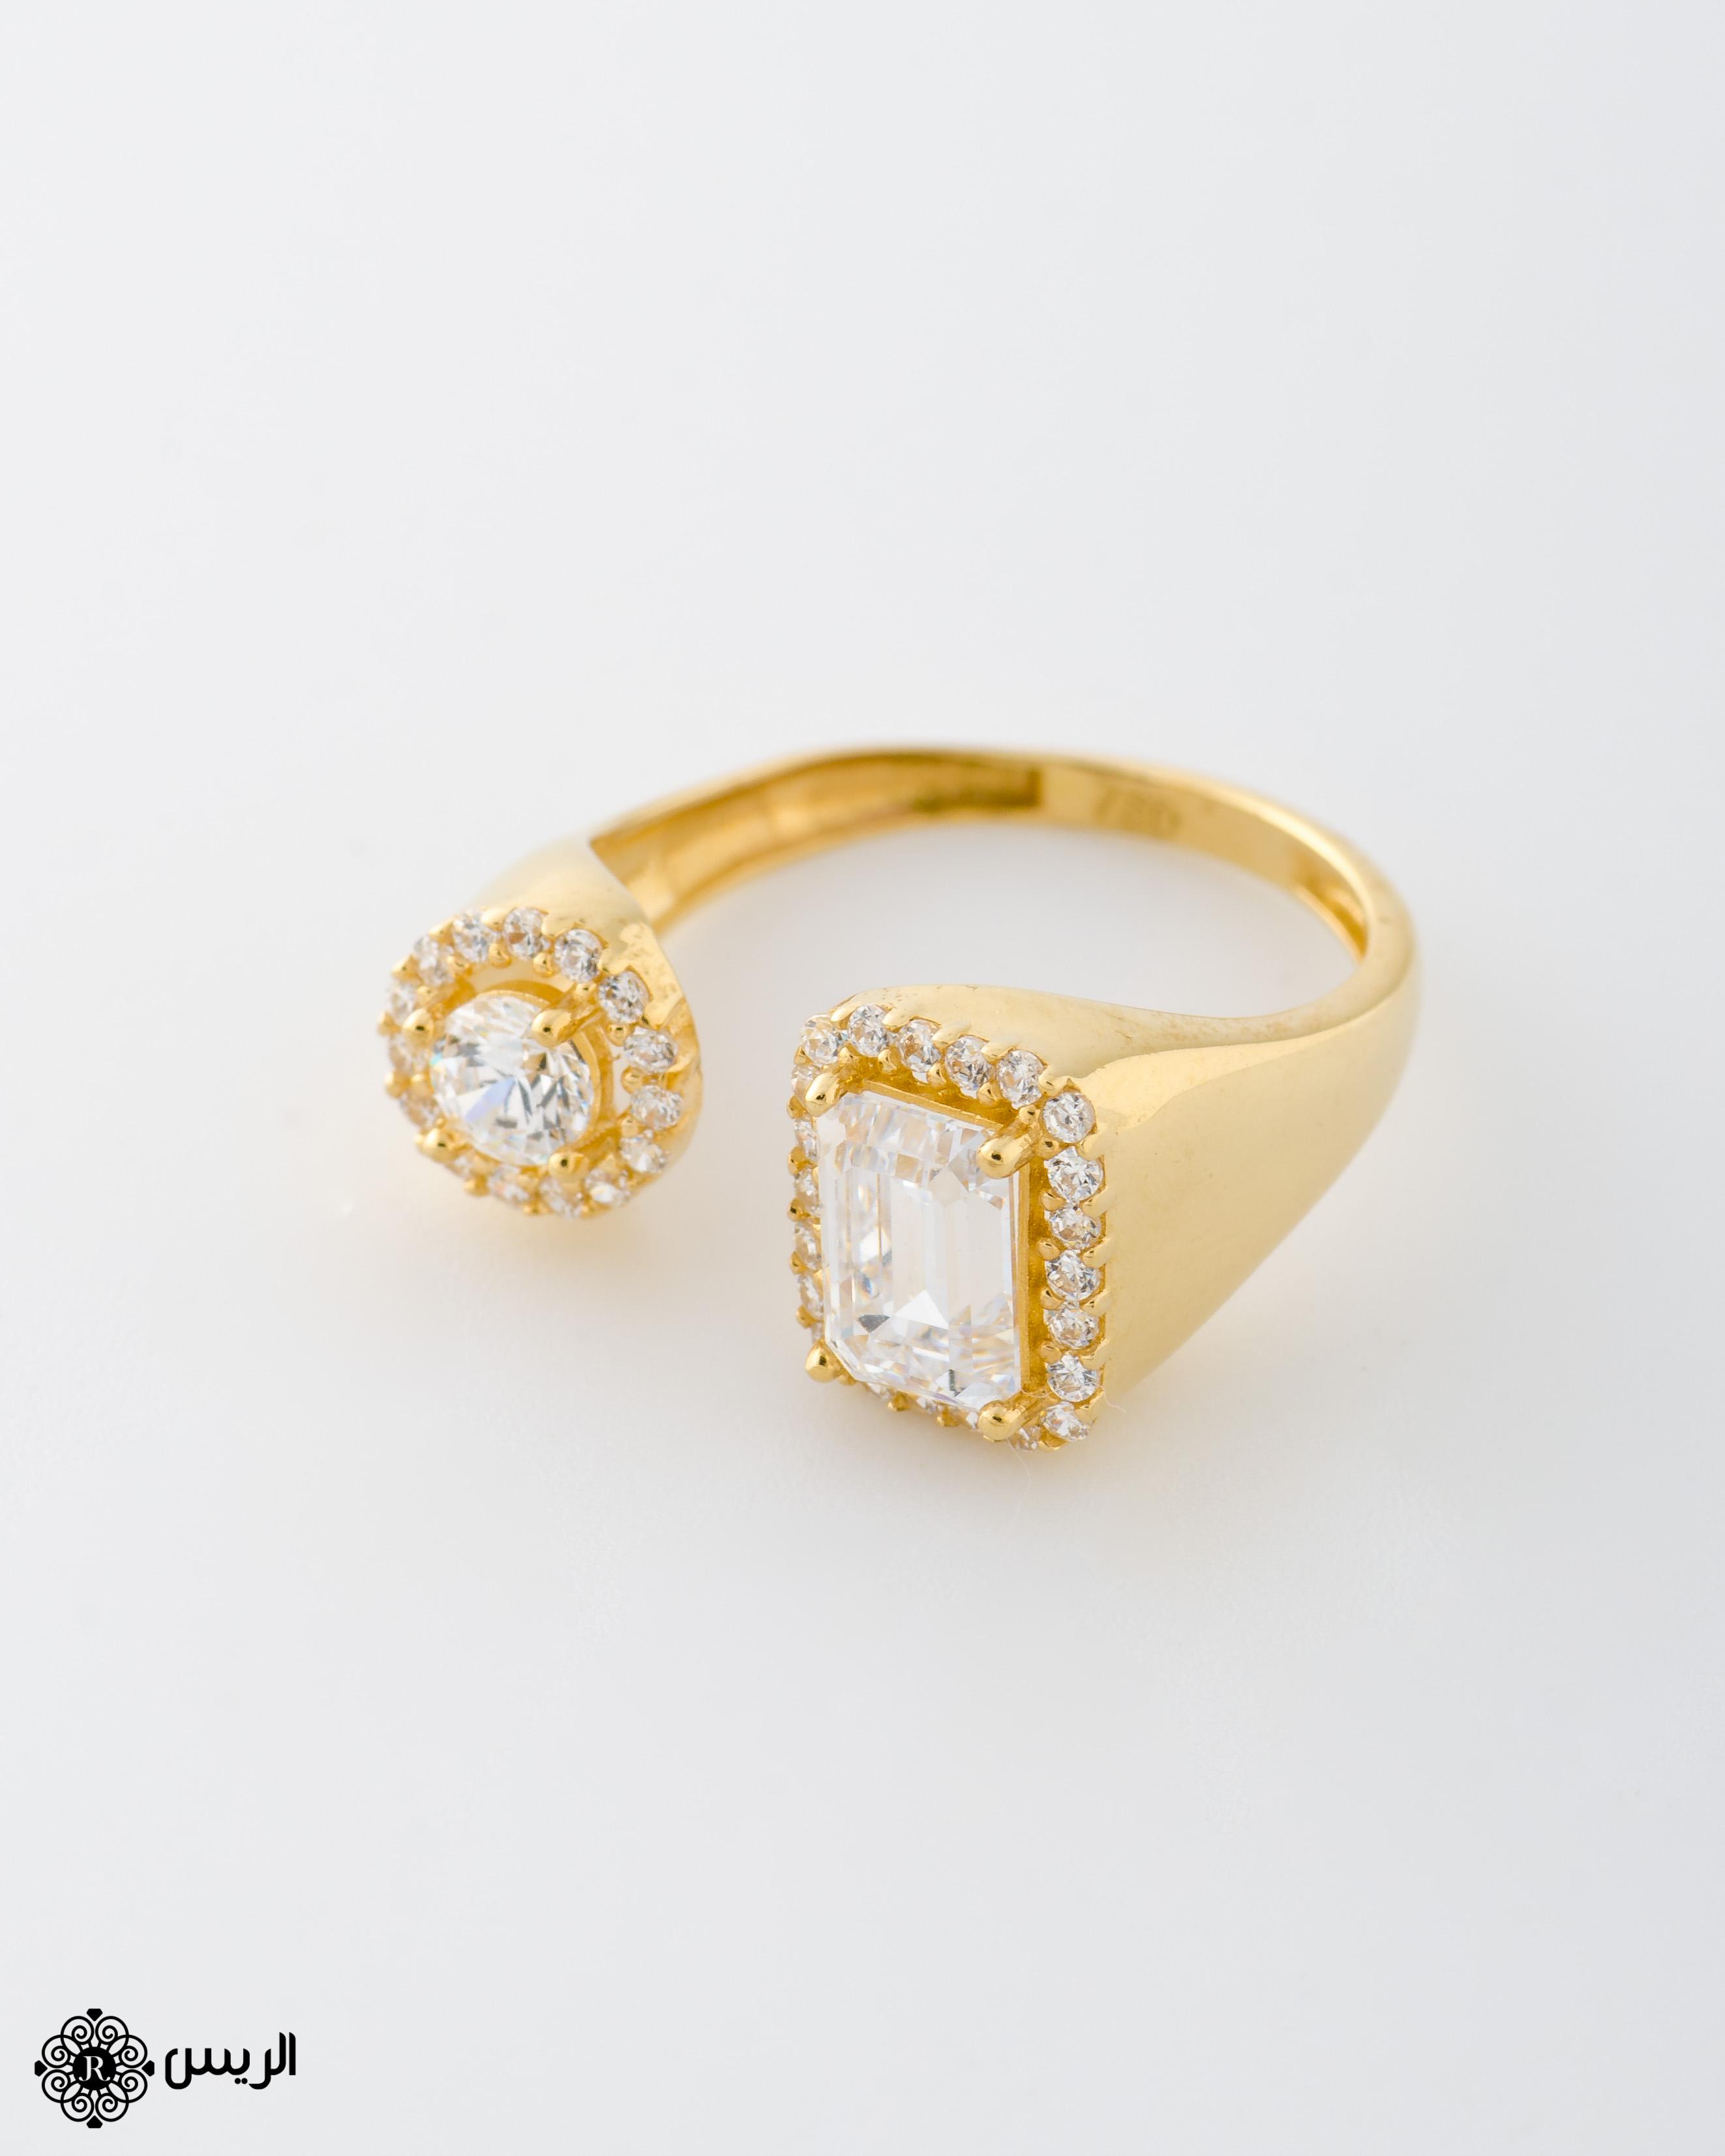 Raies jewelry Classic Design Ring خاتم تصميم كلاسيك الريس للمجوهرات